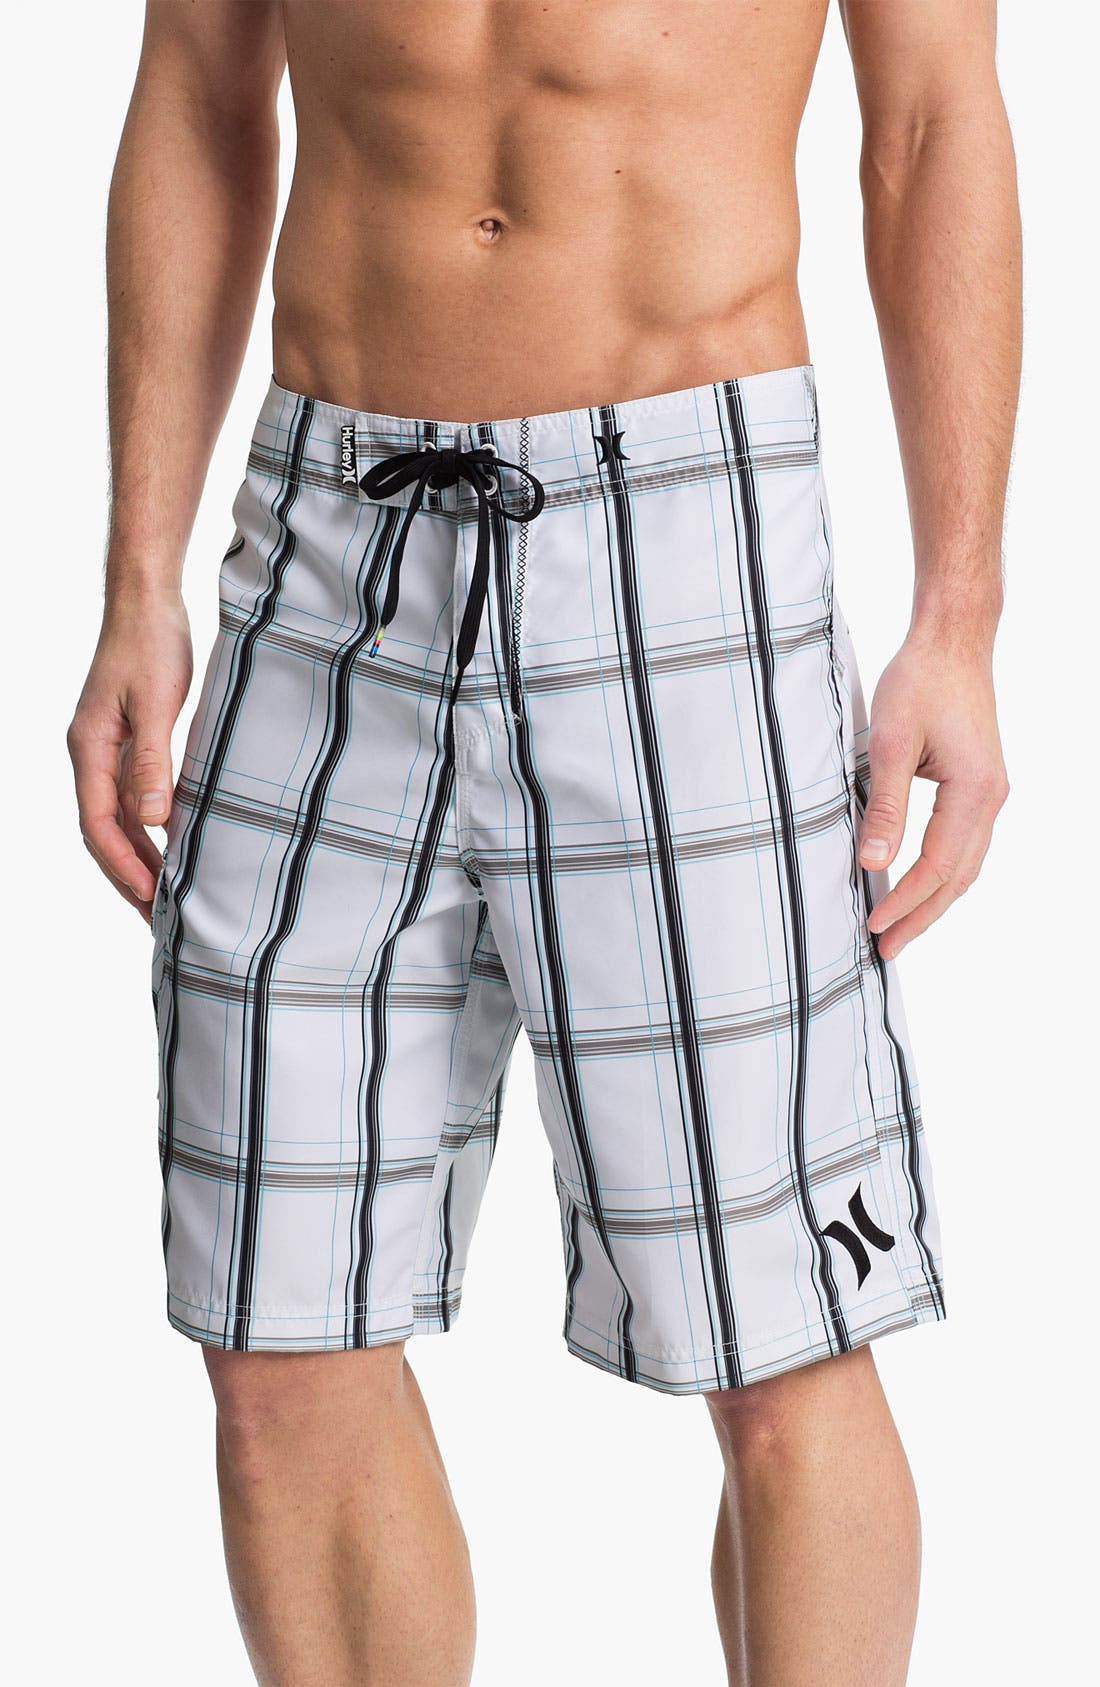 Main Image - Hurley 'Puerto Rico' Recycled Board Shorts (Men)